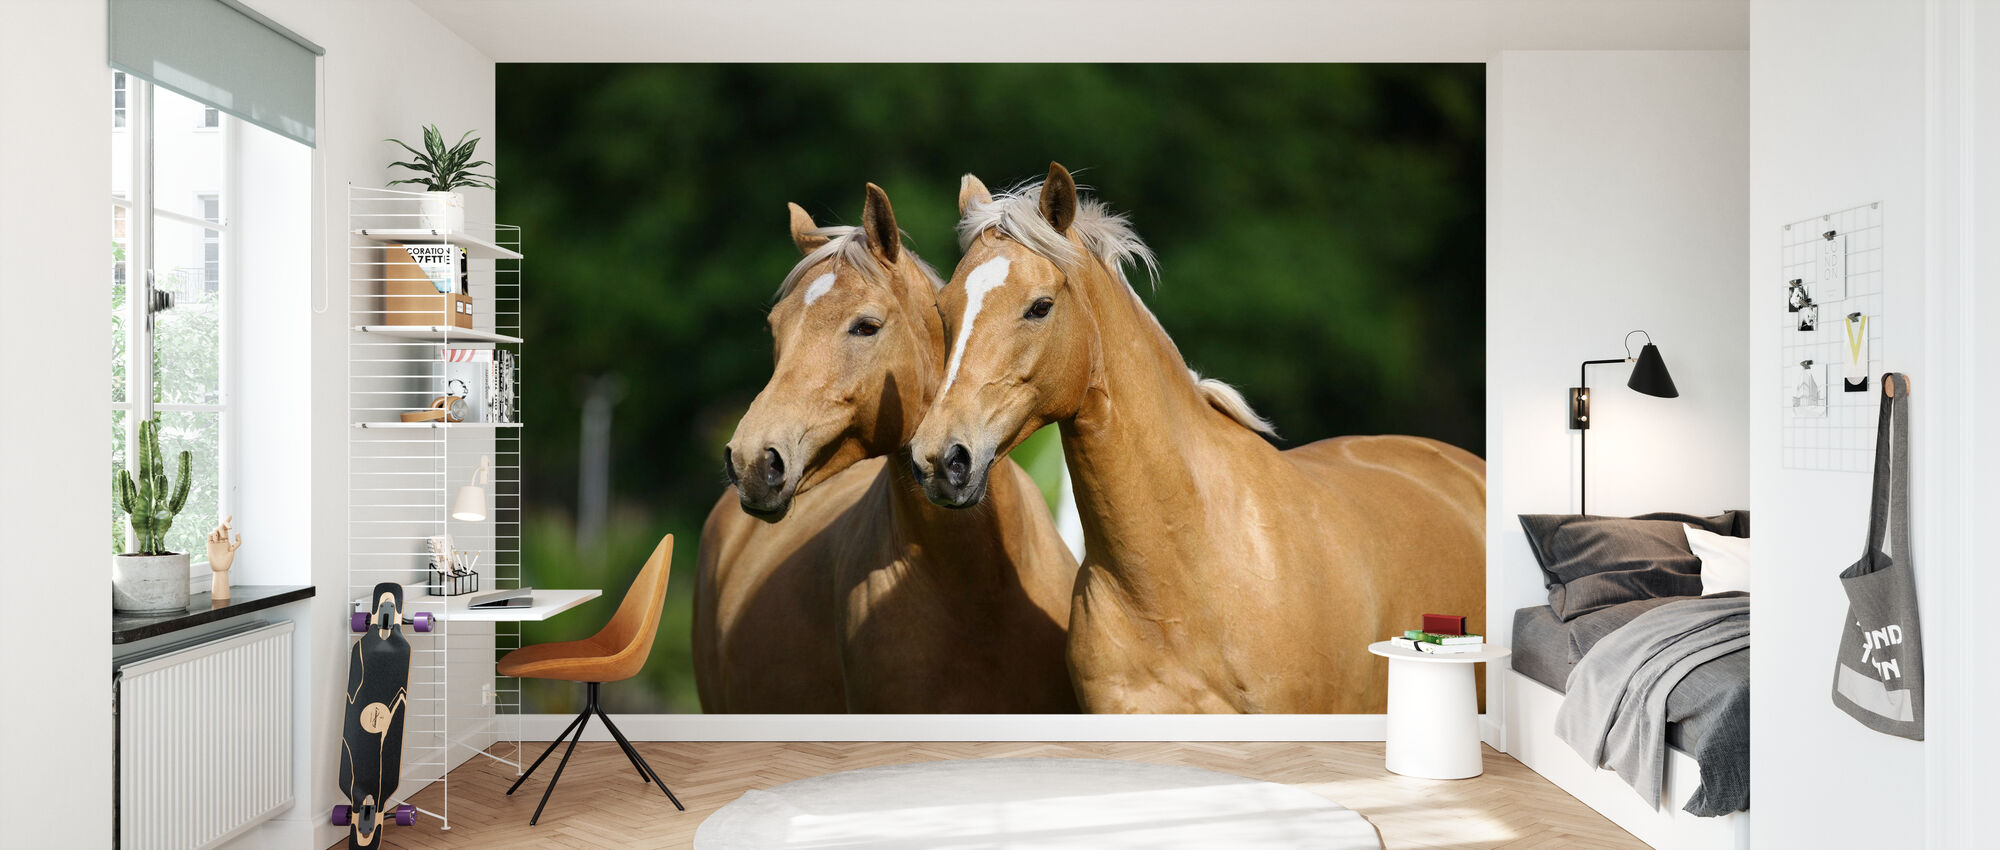 Horse Friends - Wallpaper - Kids Room